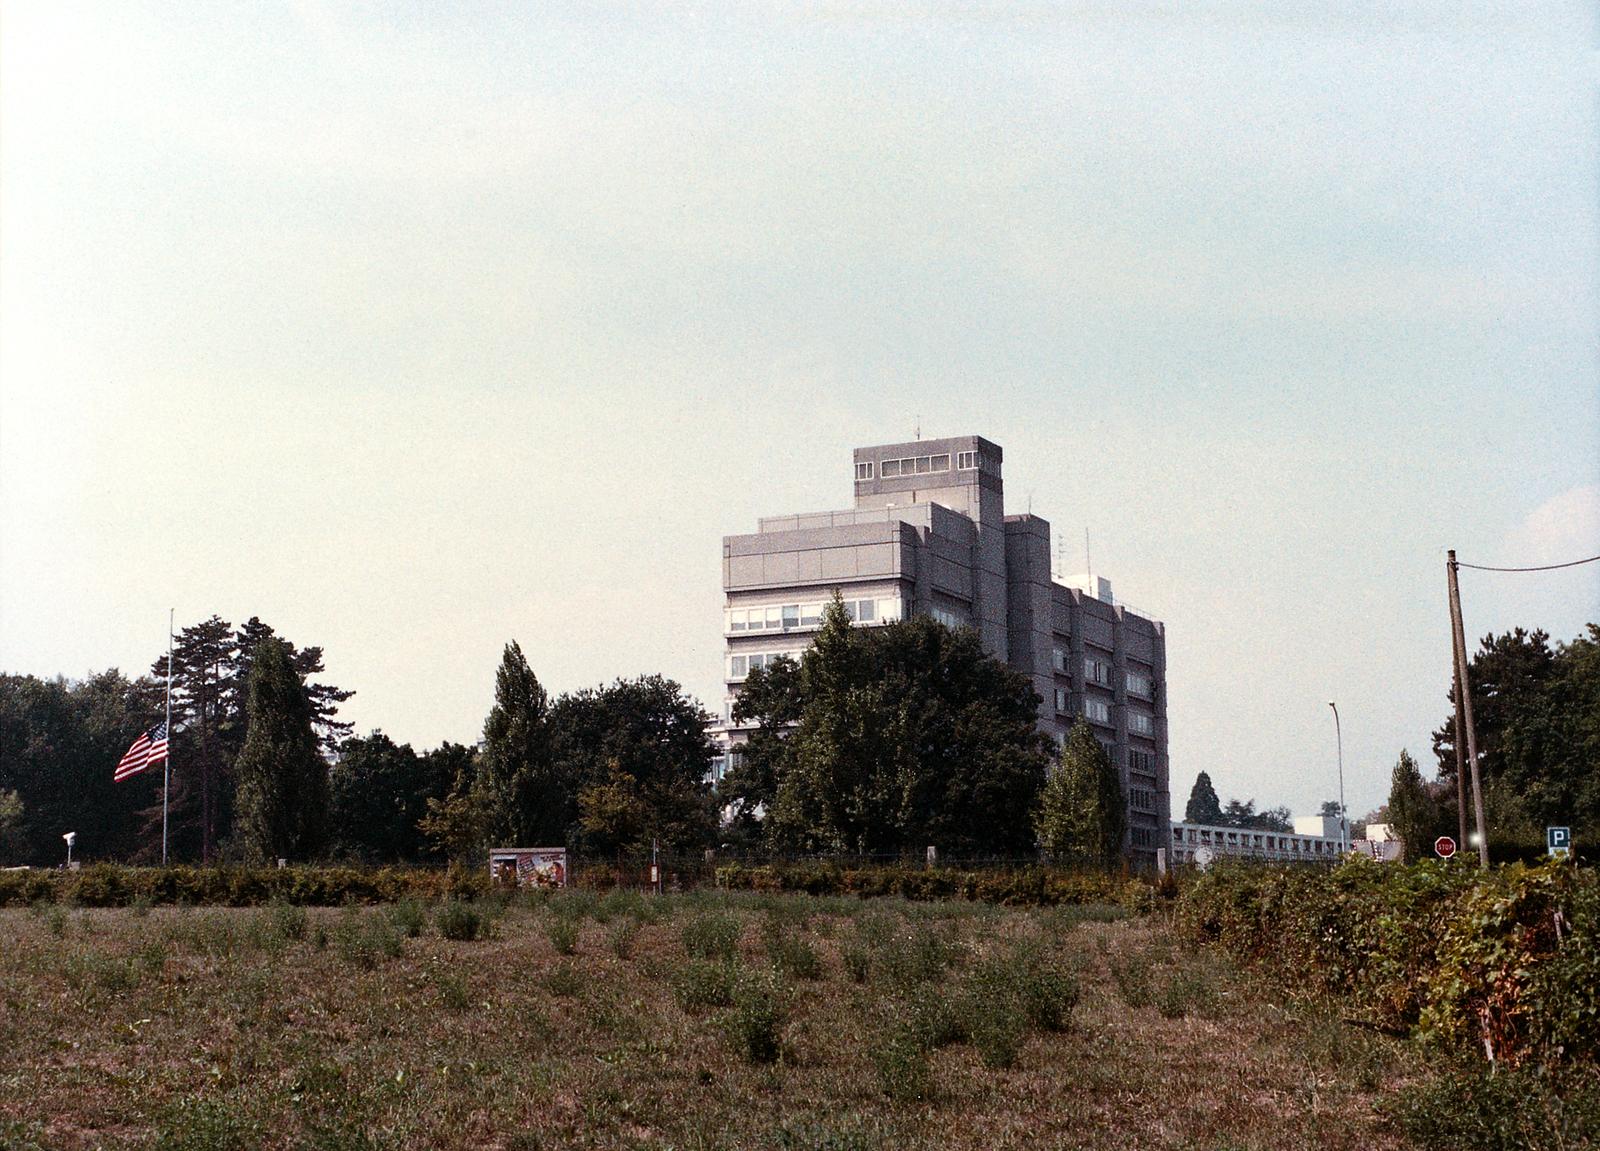 Geneva - Chancery Office Building - 1989